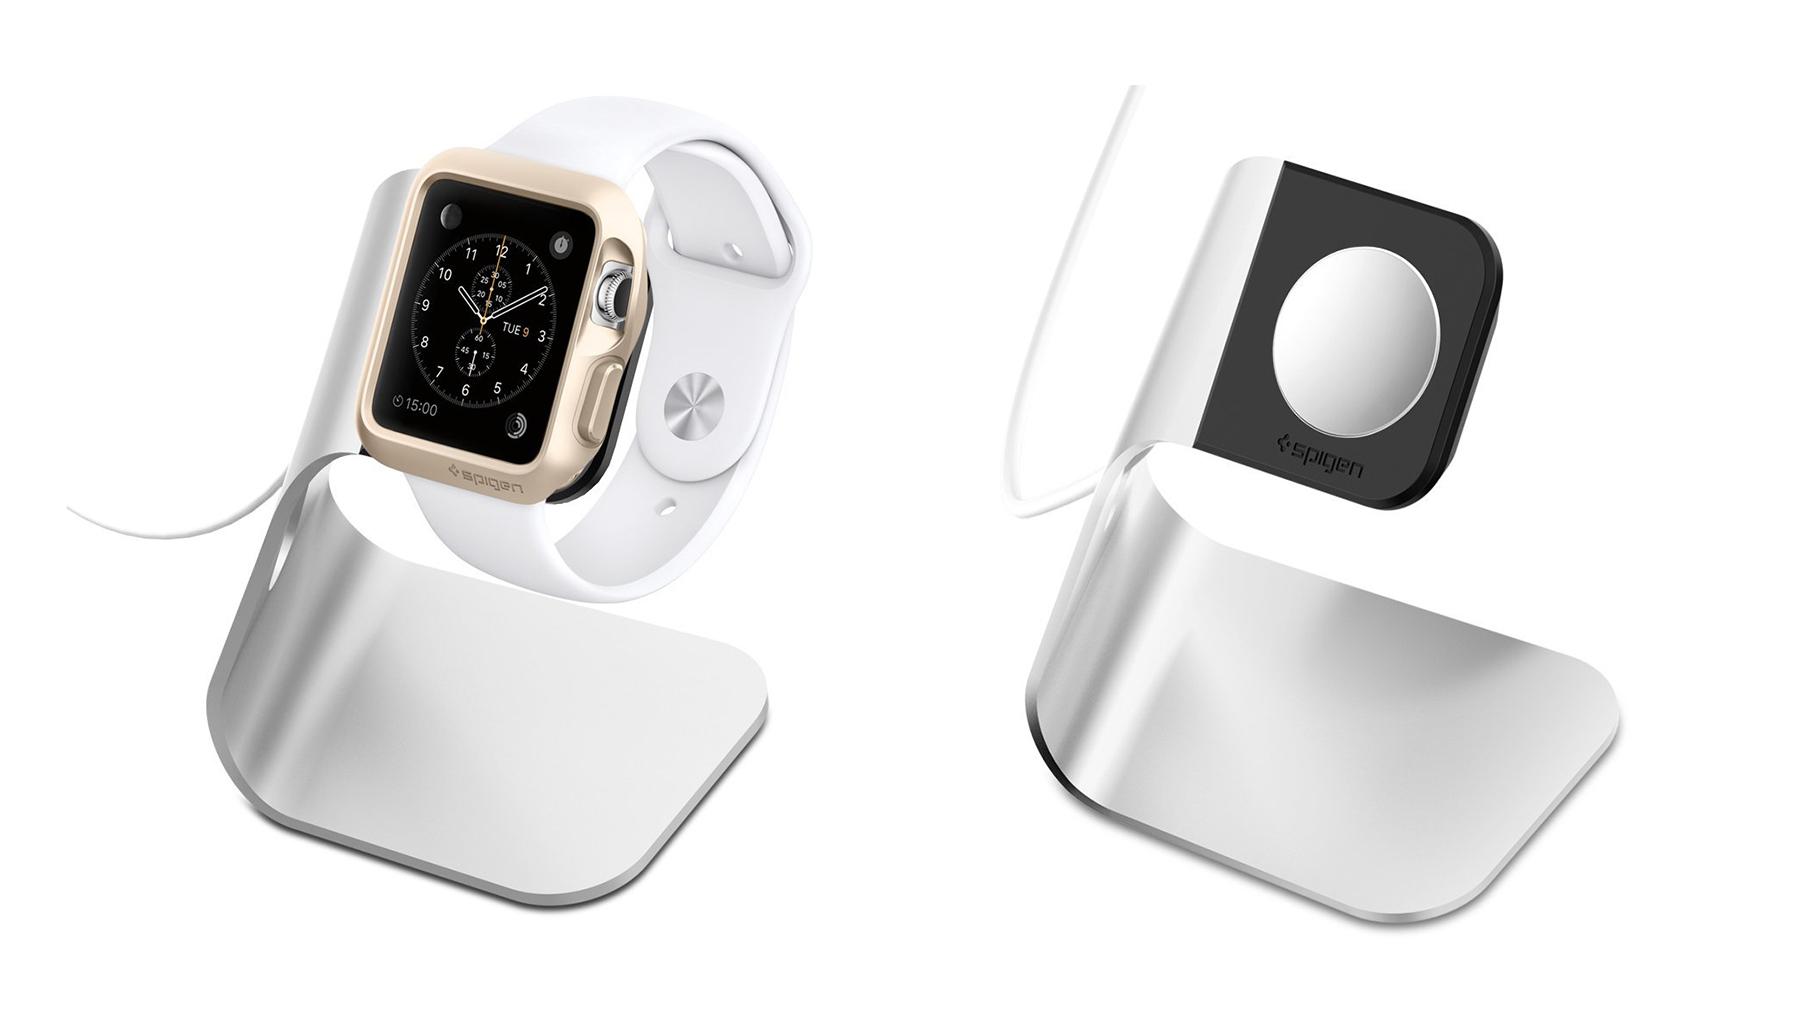 Spigen-Apple-Watch-Stand-dock-S330 (1)